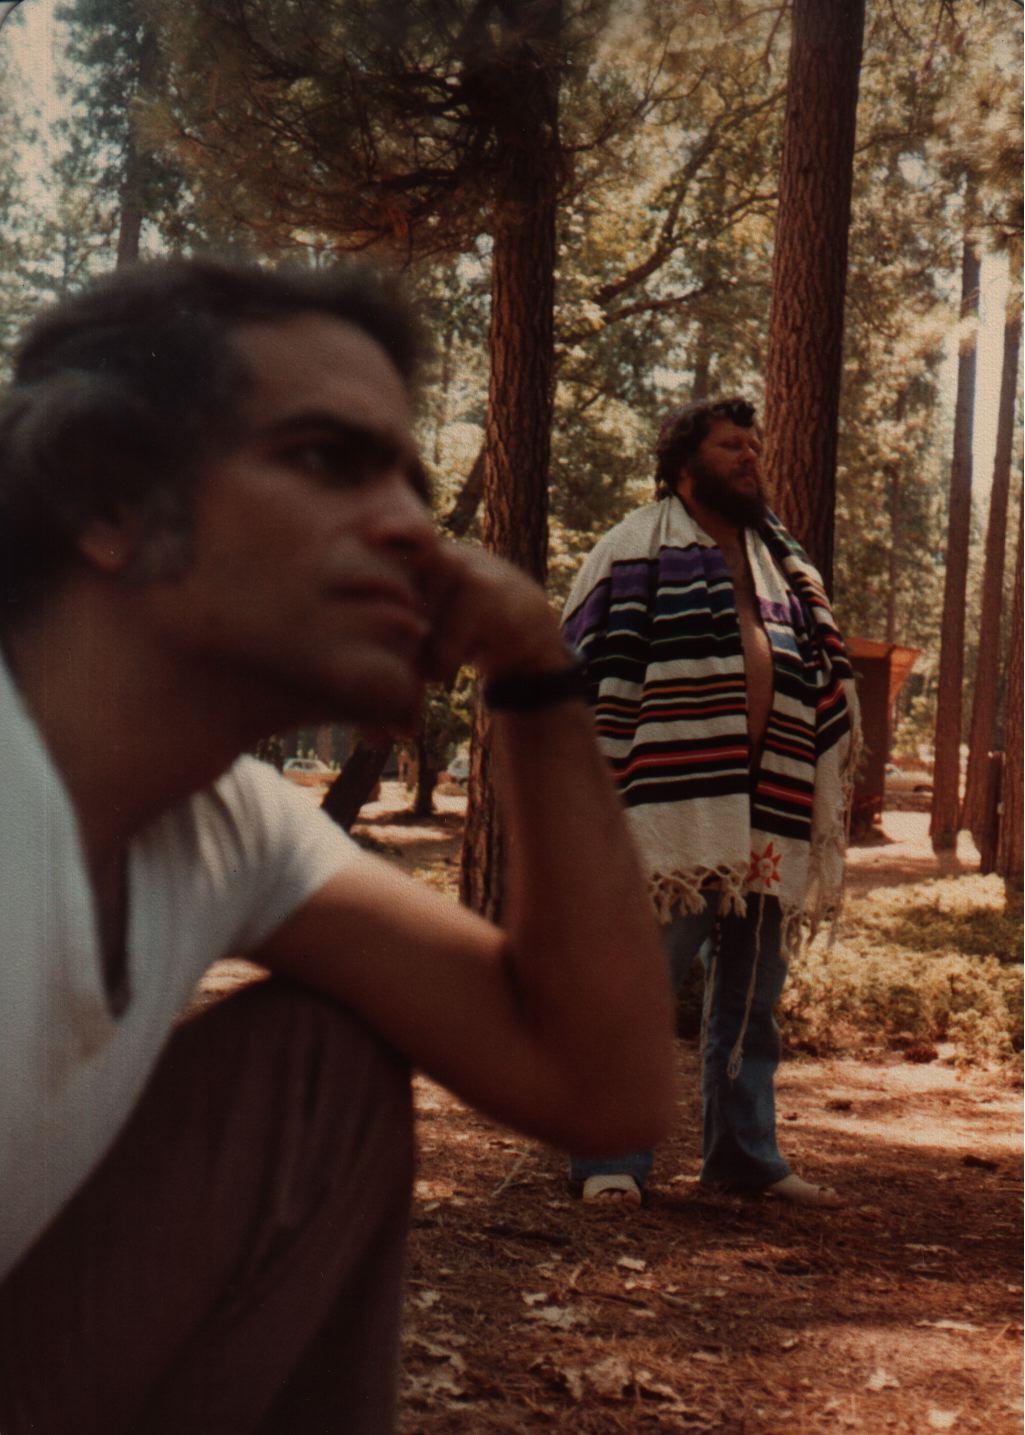 82 Joys  Barry Barkan in rainbow tallit, Jeff Wallin in foreground copy.jpg